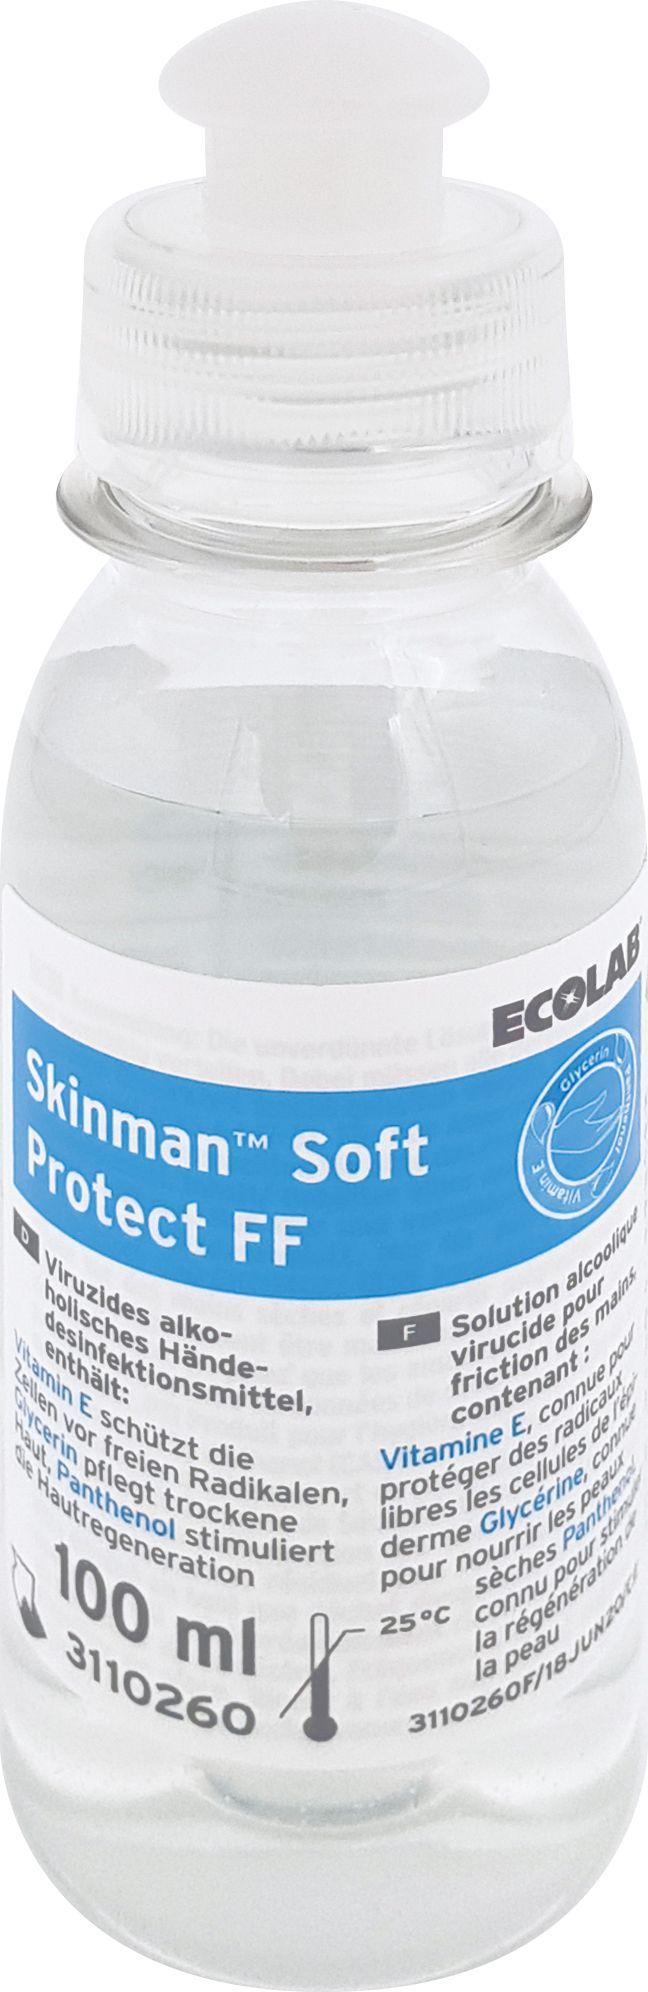 slide image Skinman™ Soft Protect FF